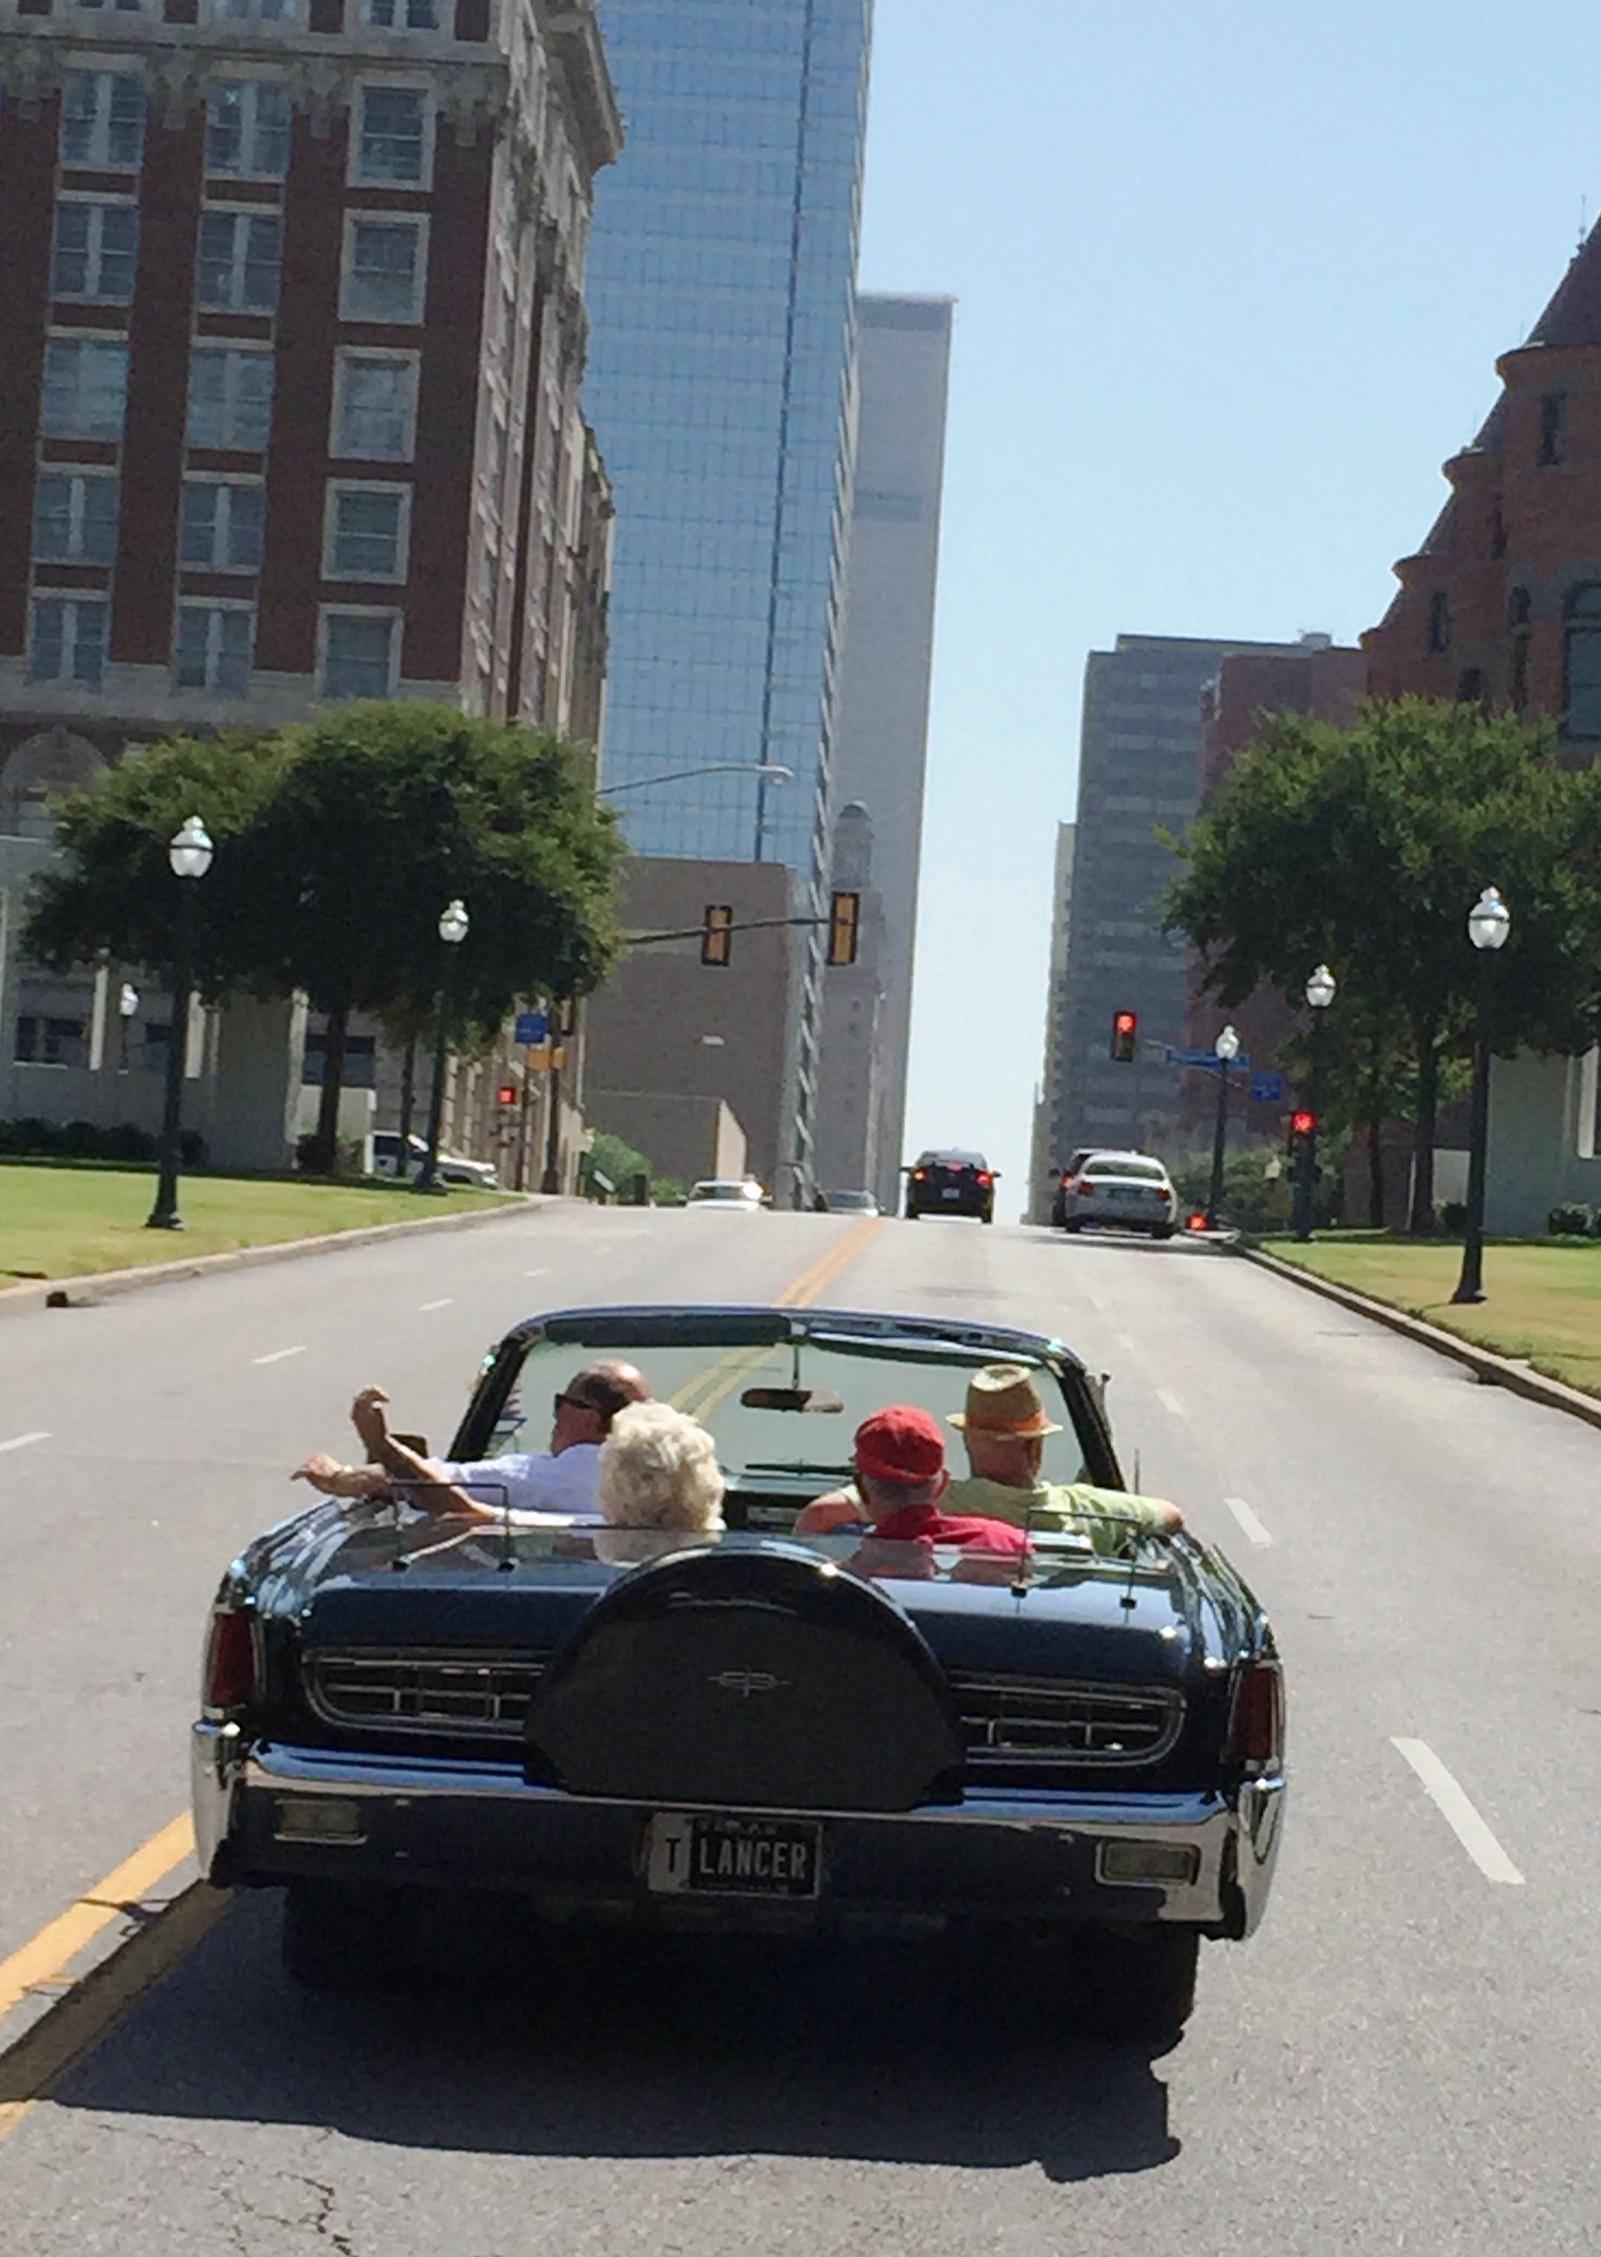 Dallas Motorcade Route